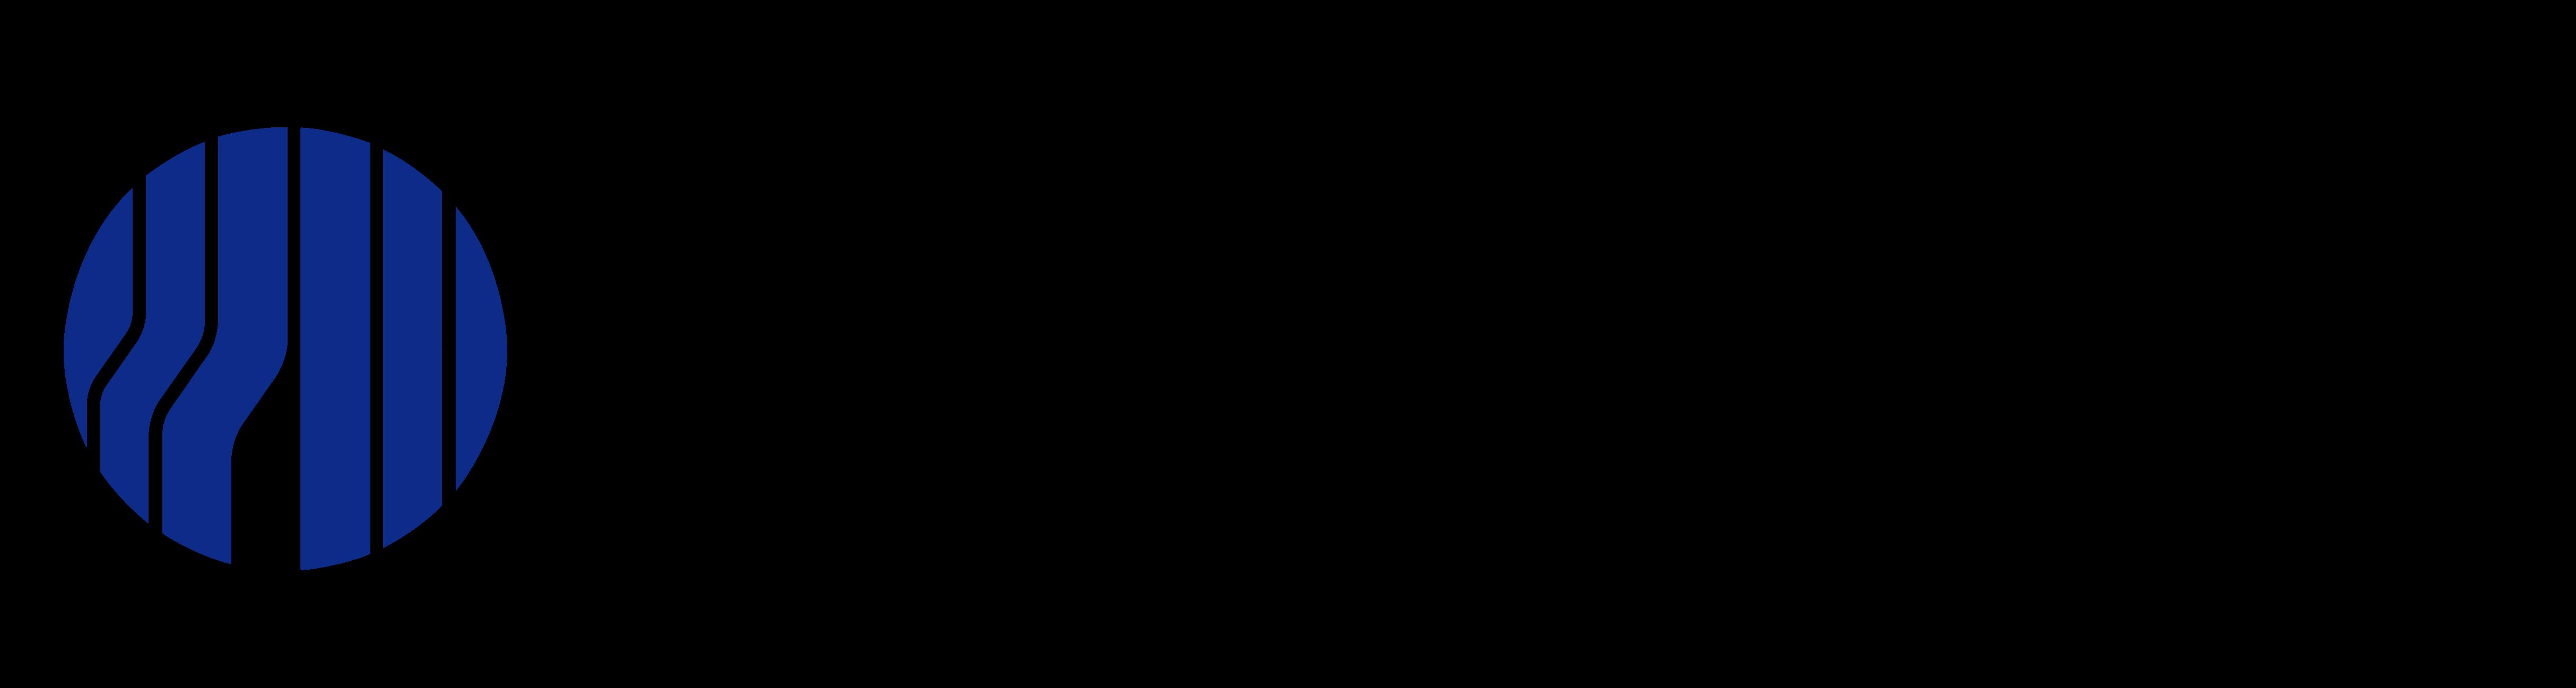 Nabors_logo